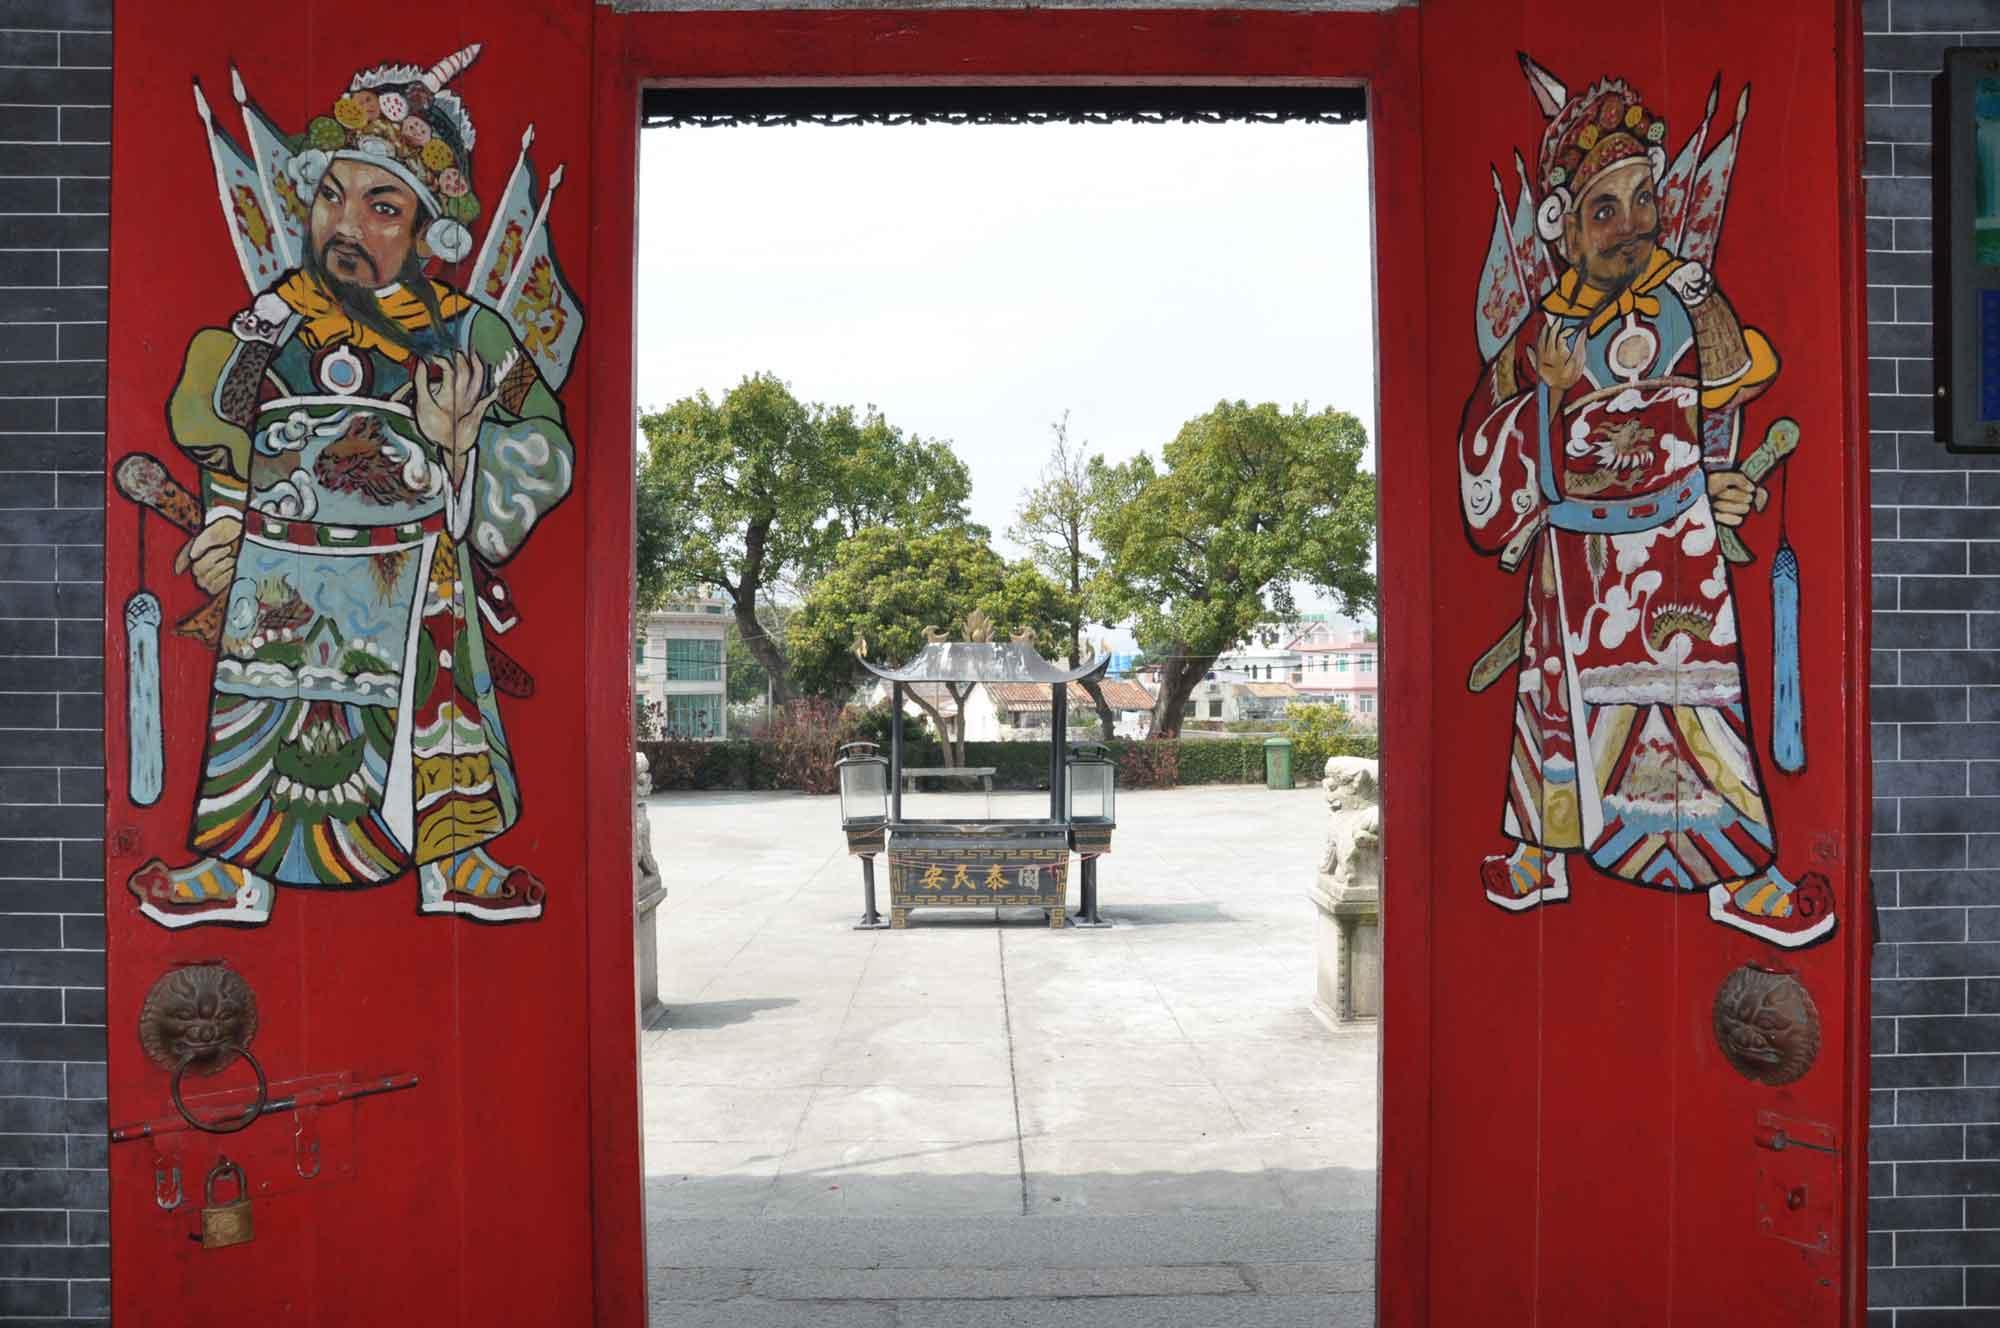 Tin Hau Temple doormen